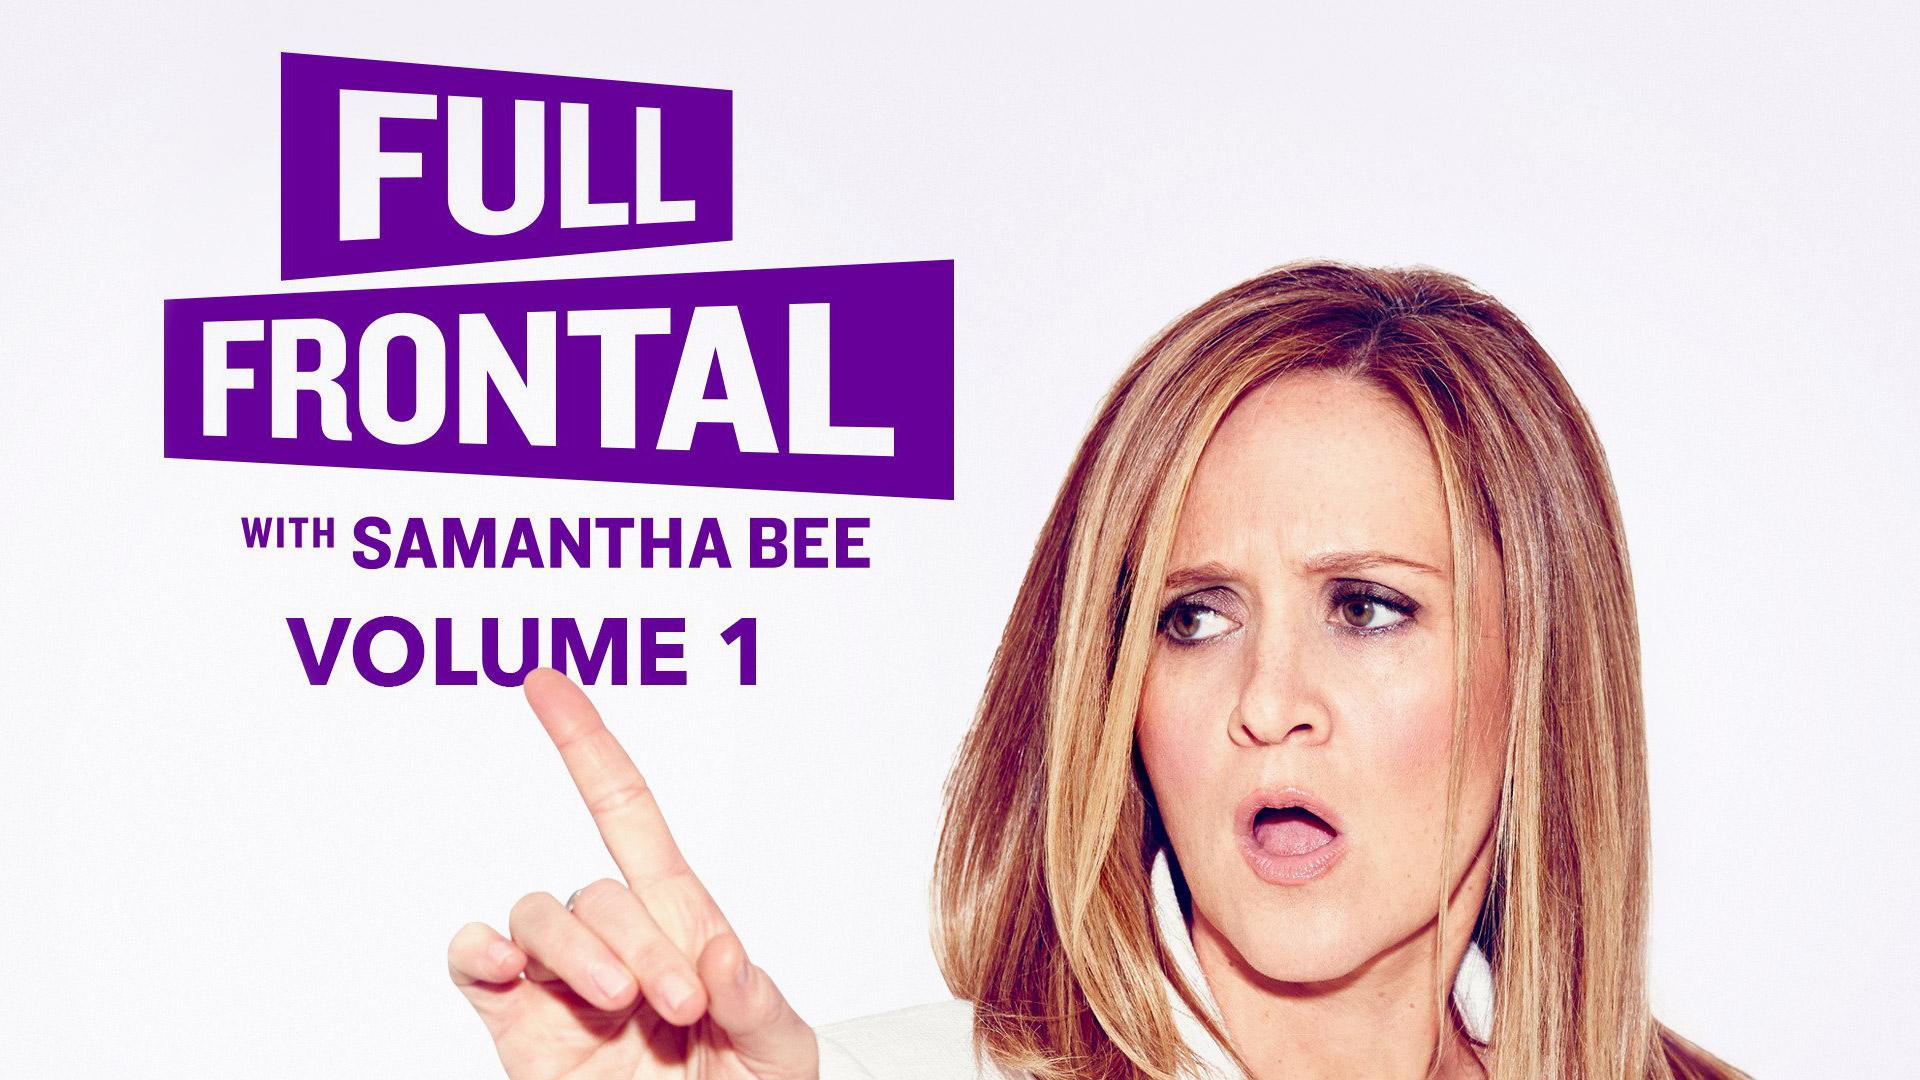 Full Frontal With Samantha Bee Season 1